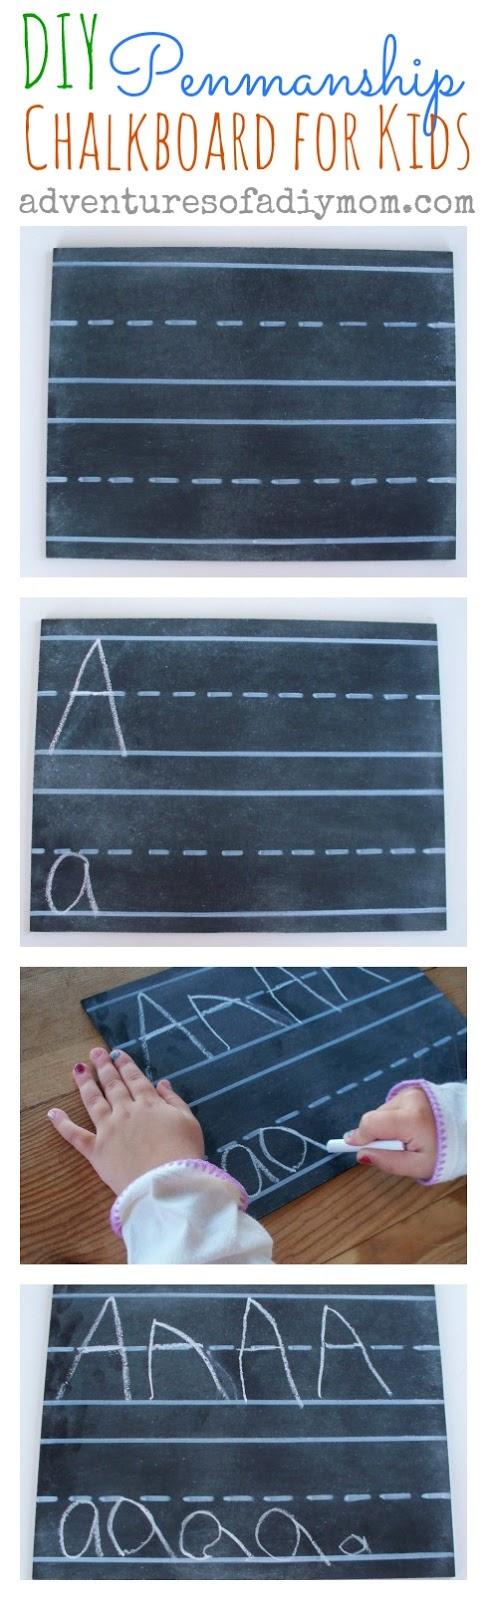 DIY Penmanship Chalkboard for Kids